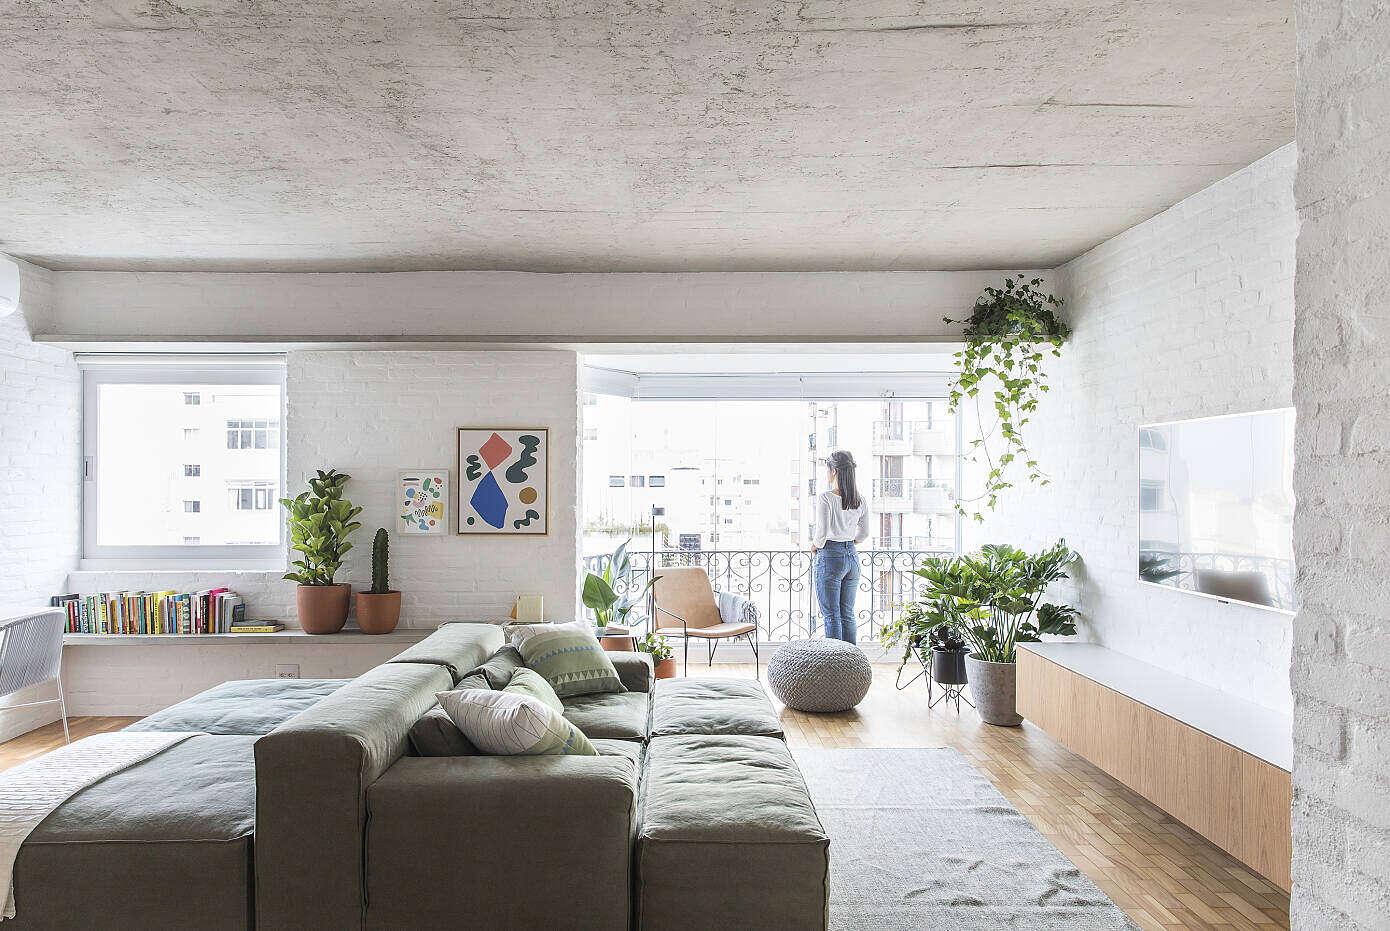 VCH Apartment by David Ito Arquitetura